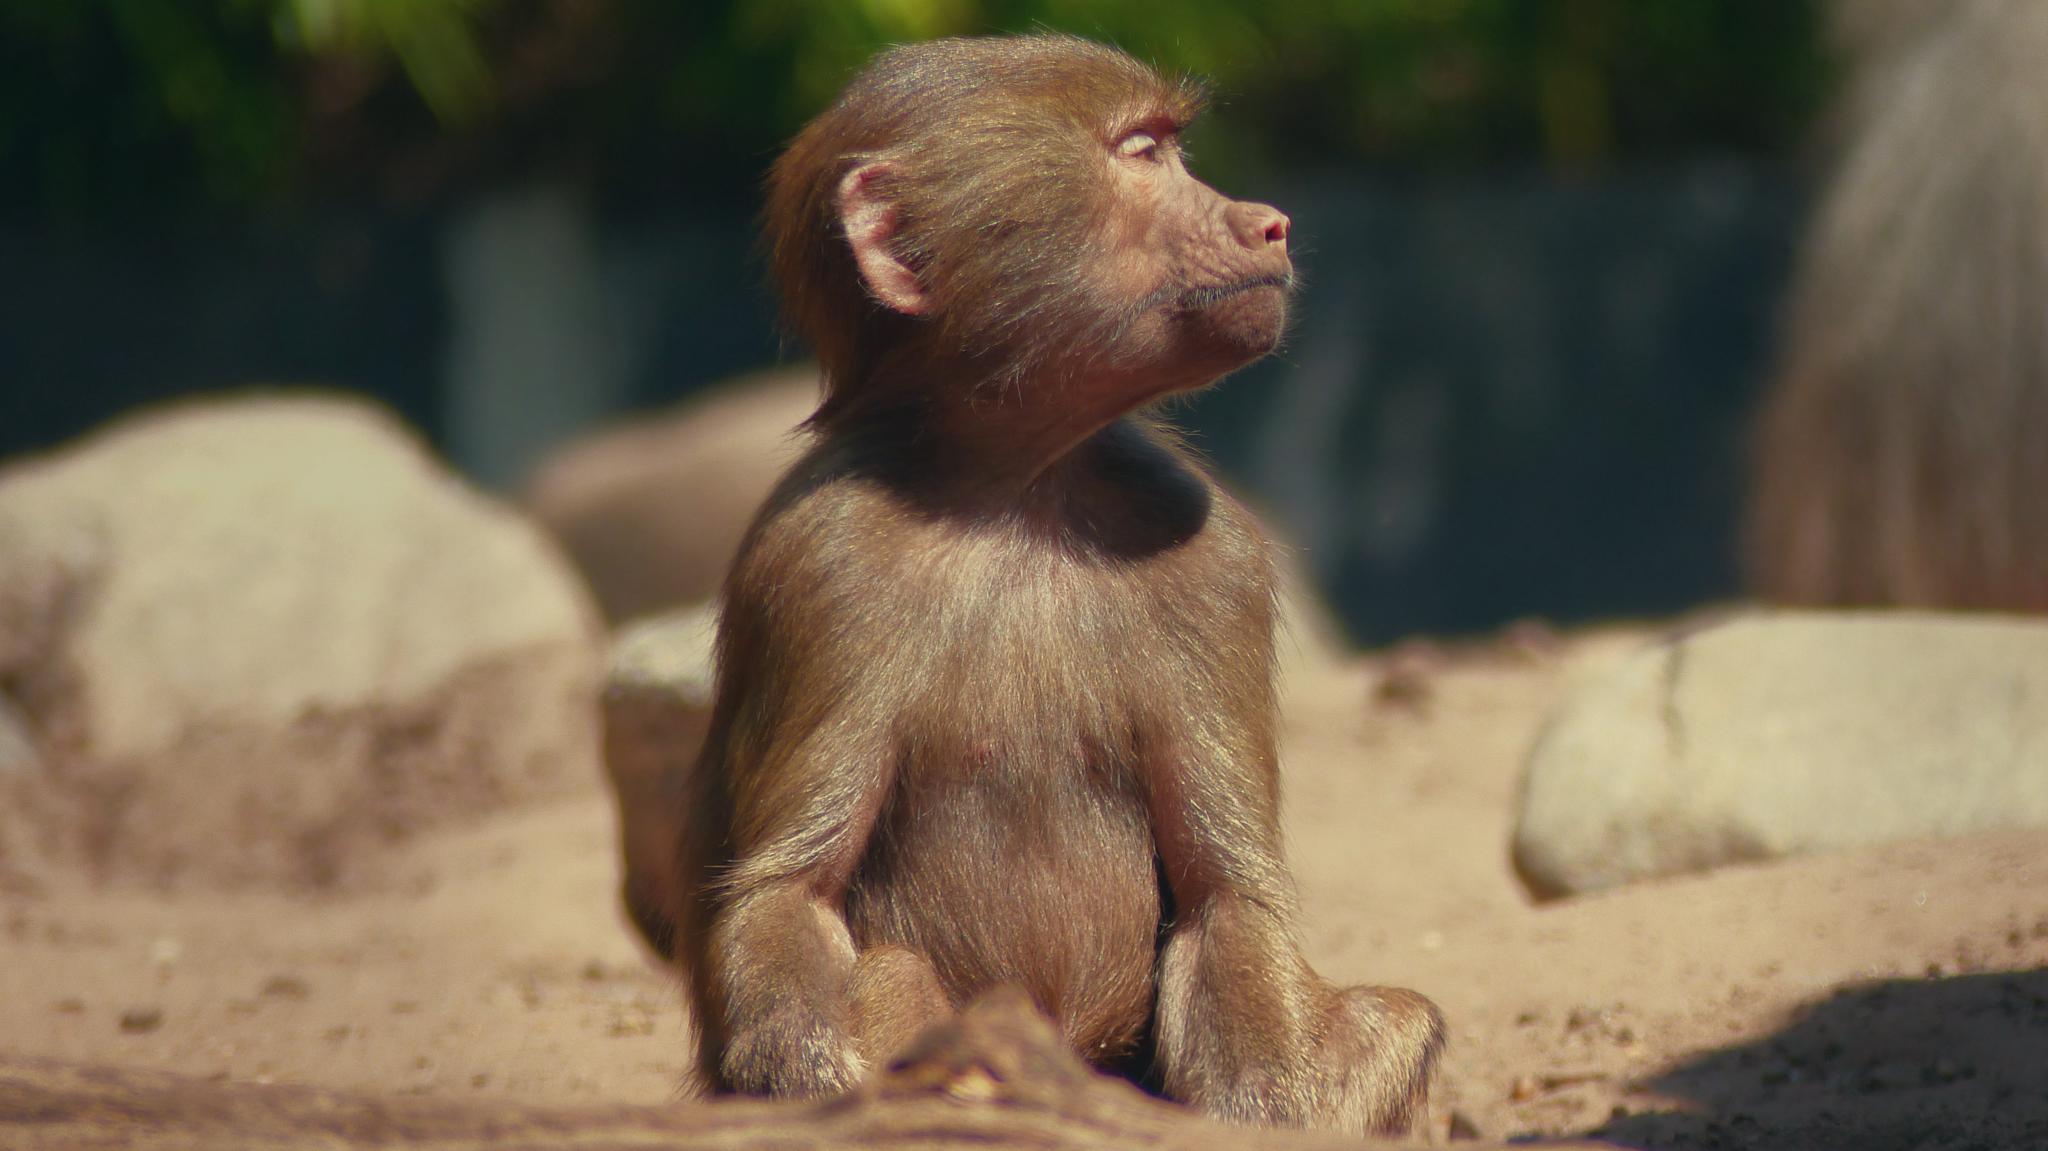 Sun Monkey by sven.kunenborg